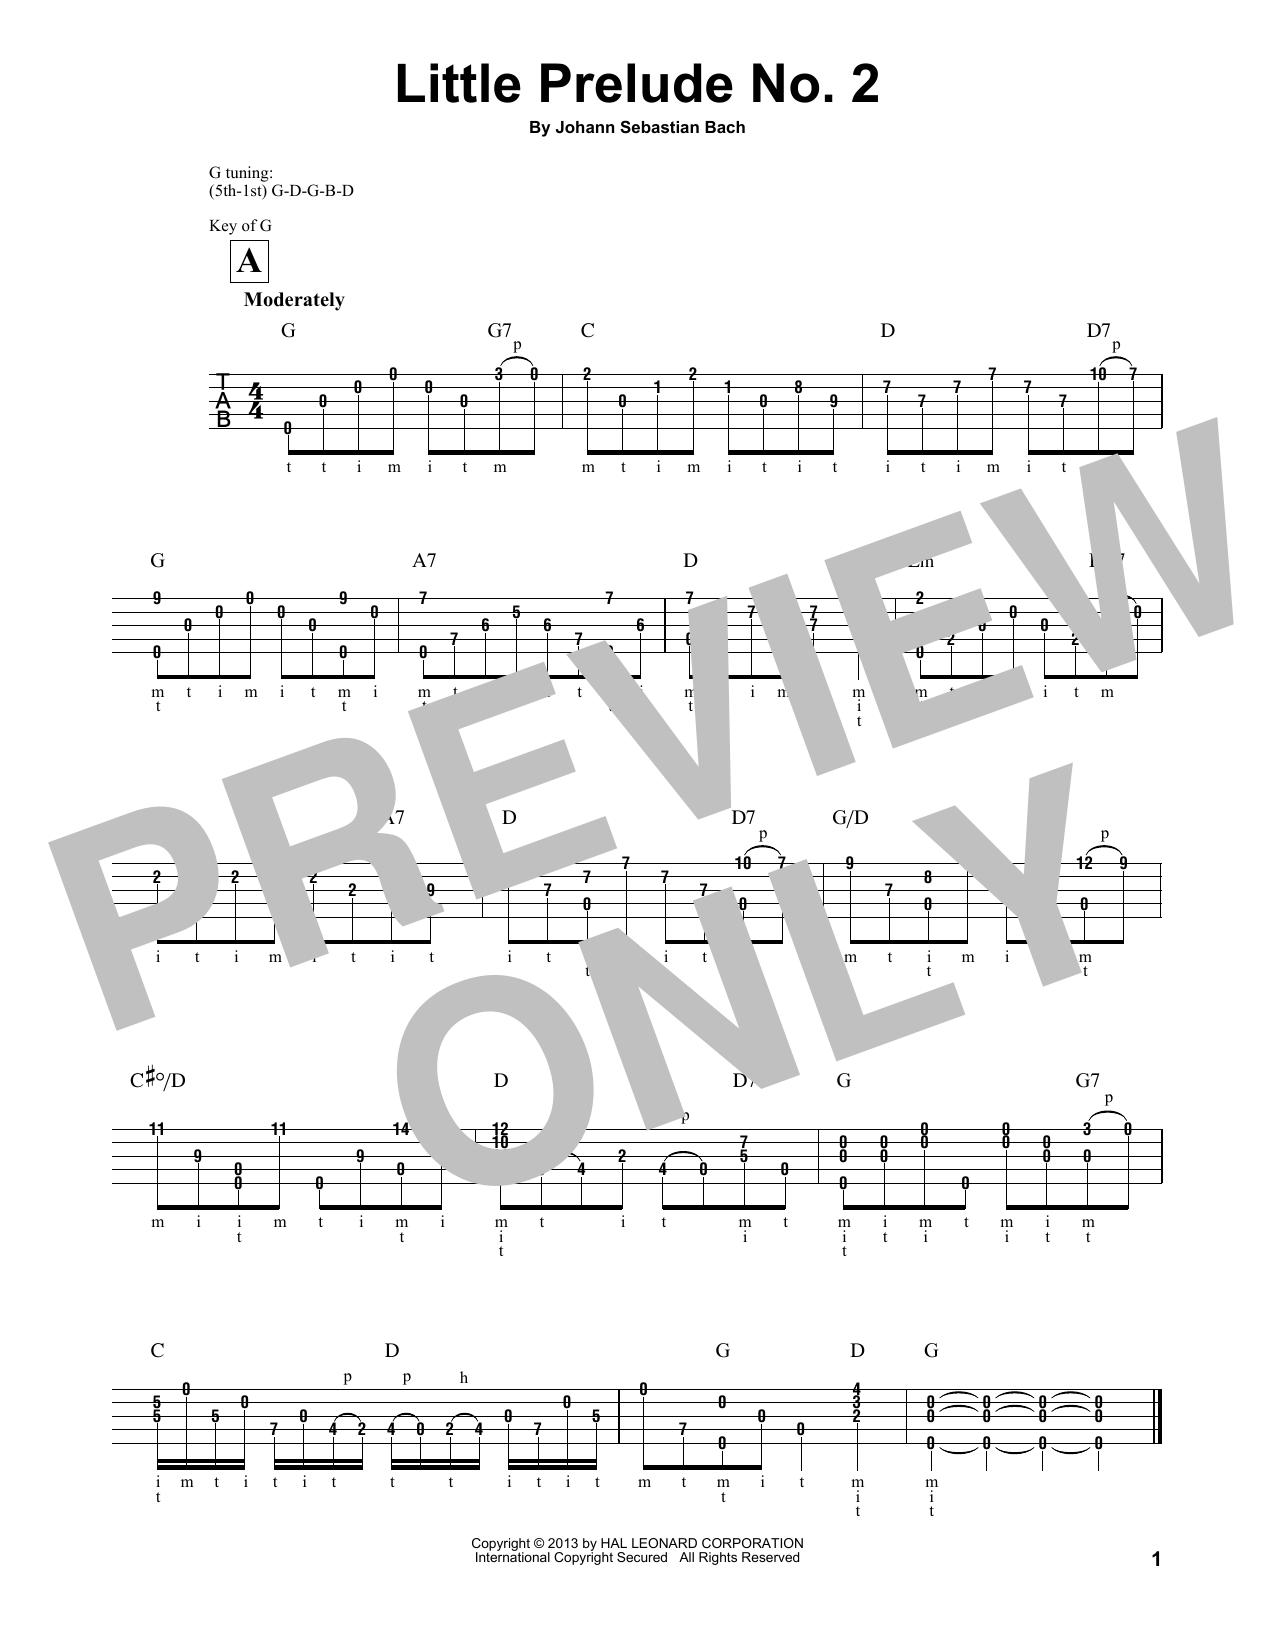 Little Prelude No. 2 in C Major Sheet Music